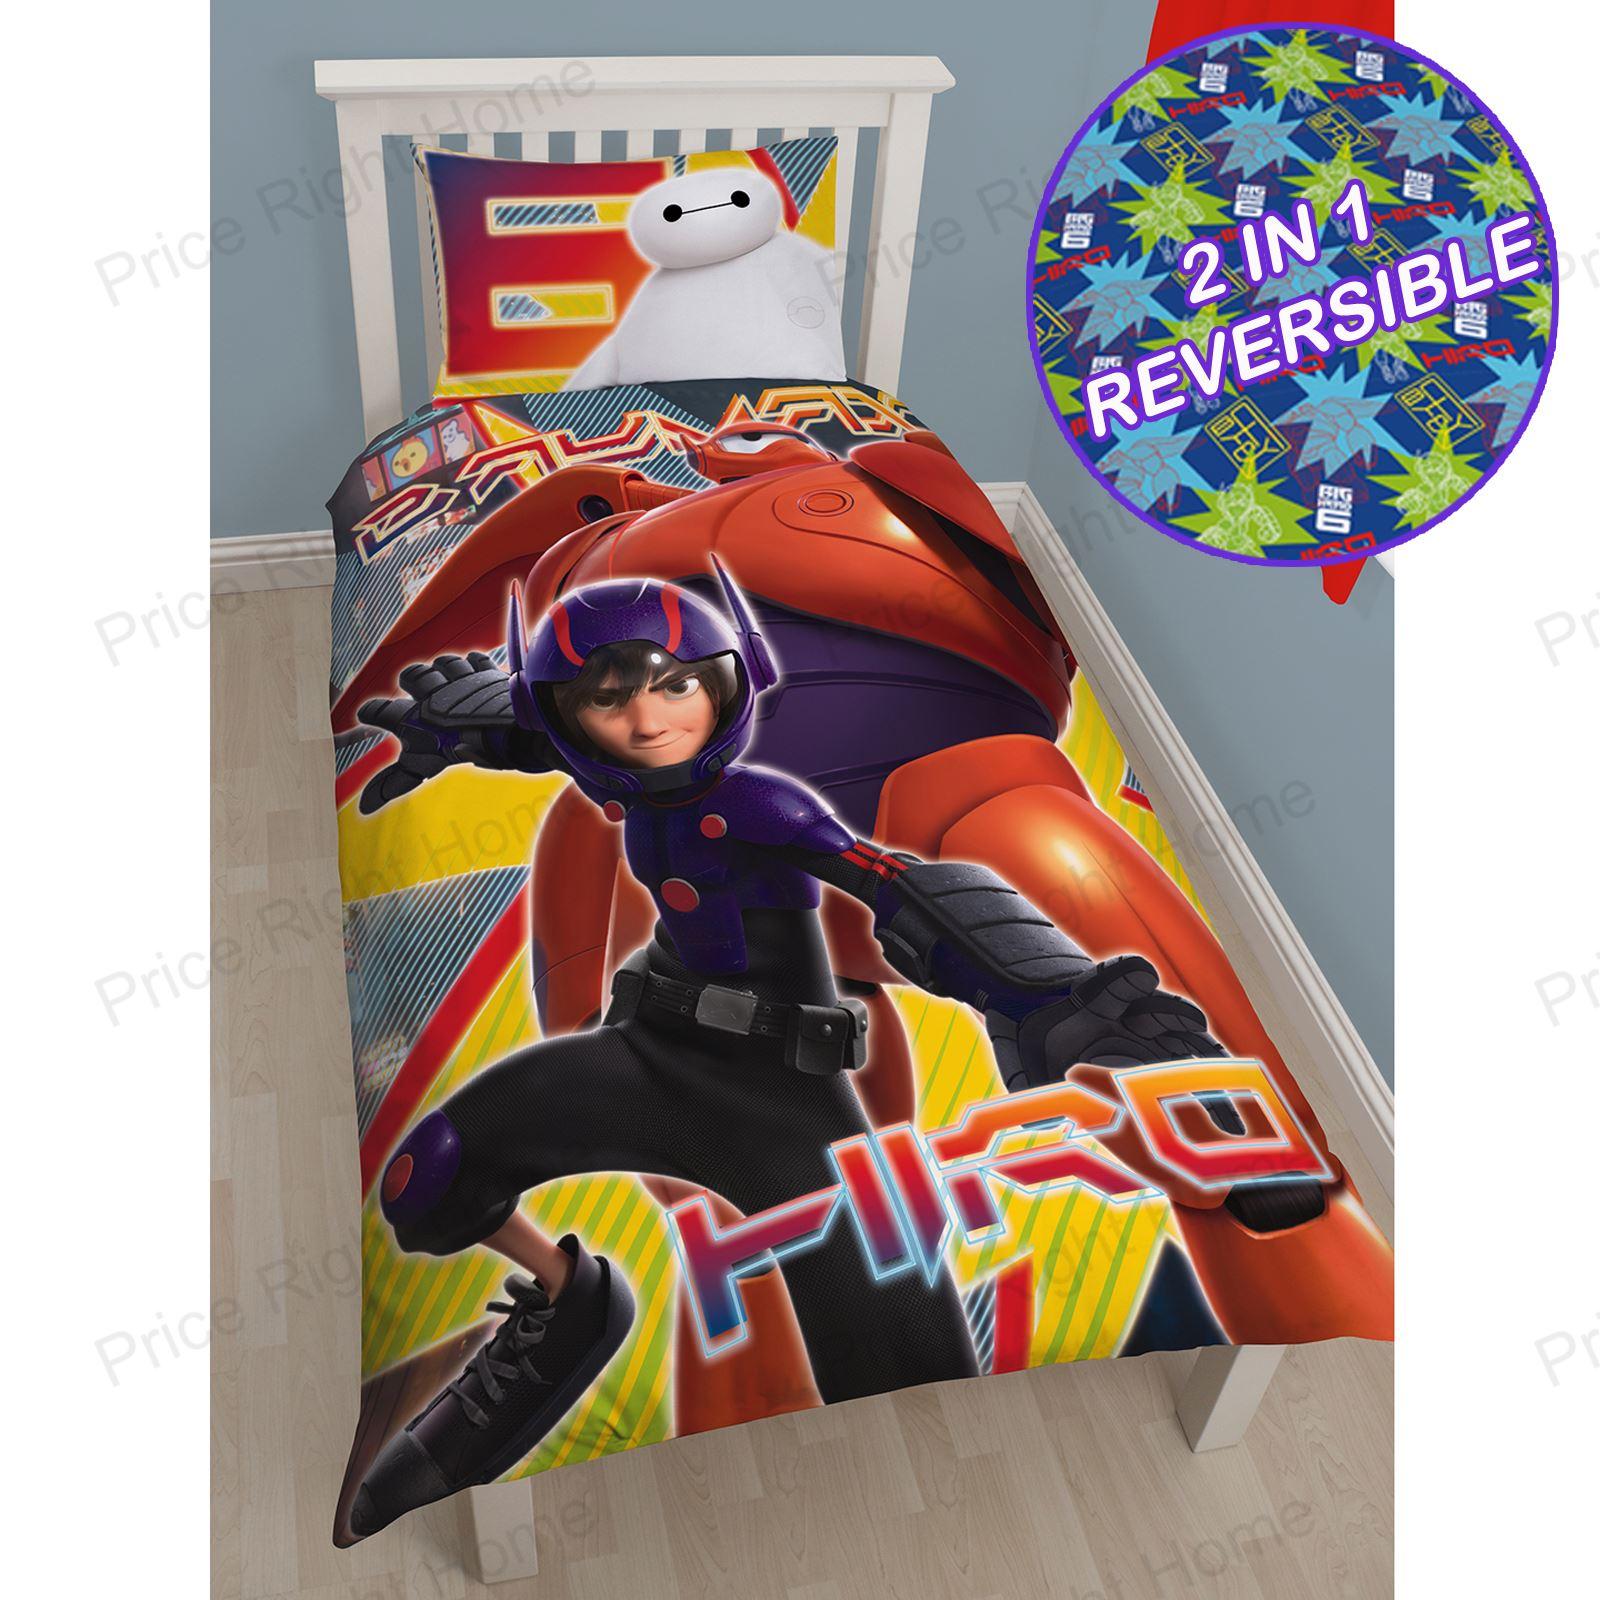 Personaje-Infantil-Edredon-Juego-De-Oficial-Ropa-cama-Frozen-Avengers-Sofia